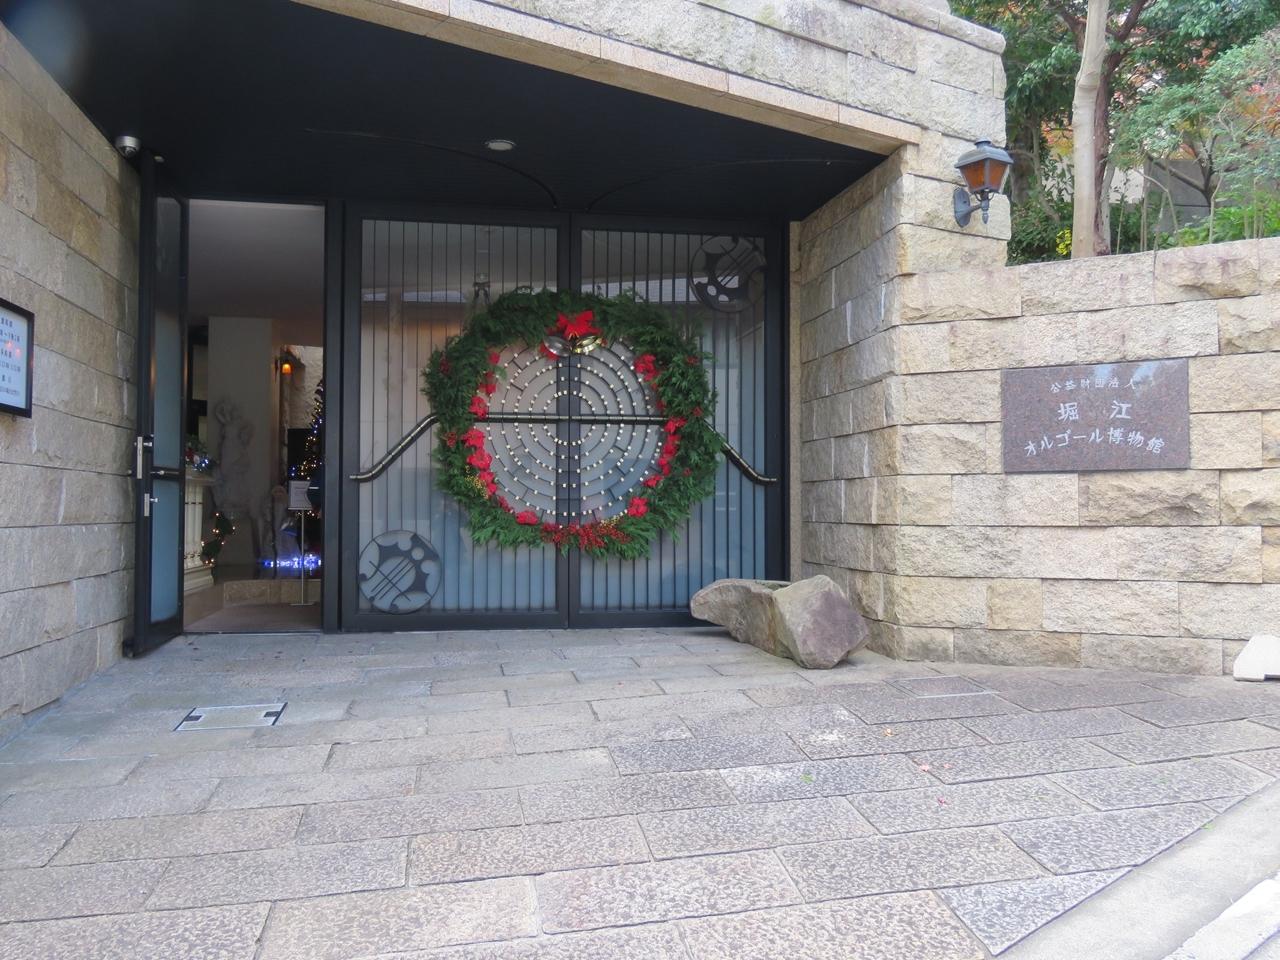 s-堀江オルゴール館